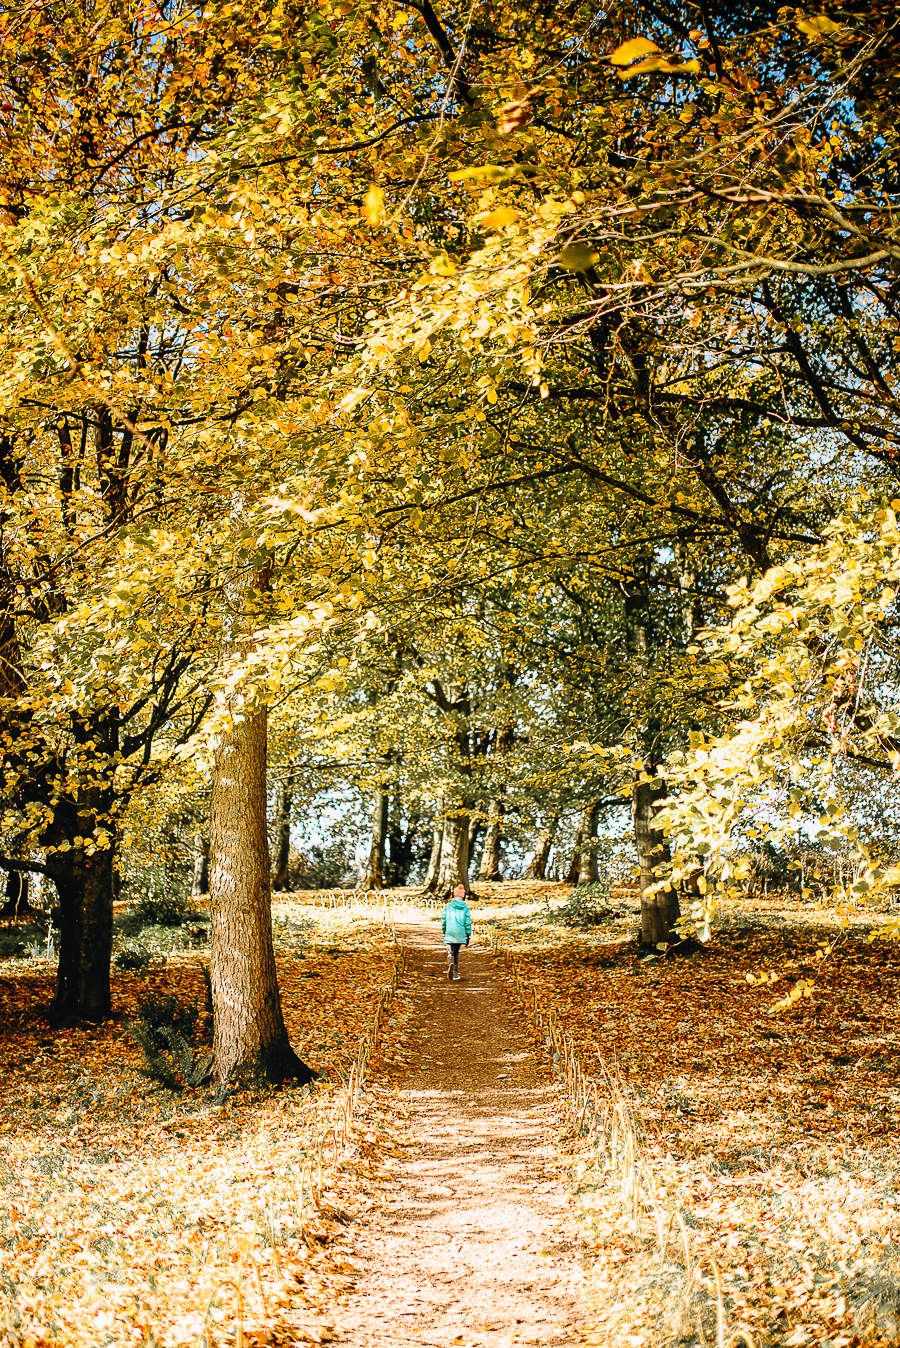 OurBeautifulAdventure-GettingOutdoorsinWales-October-websize-0315.jpg